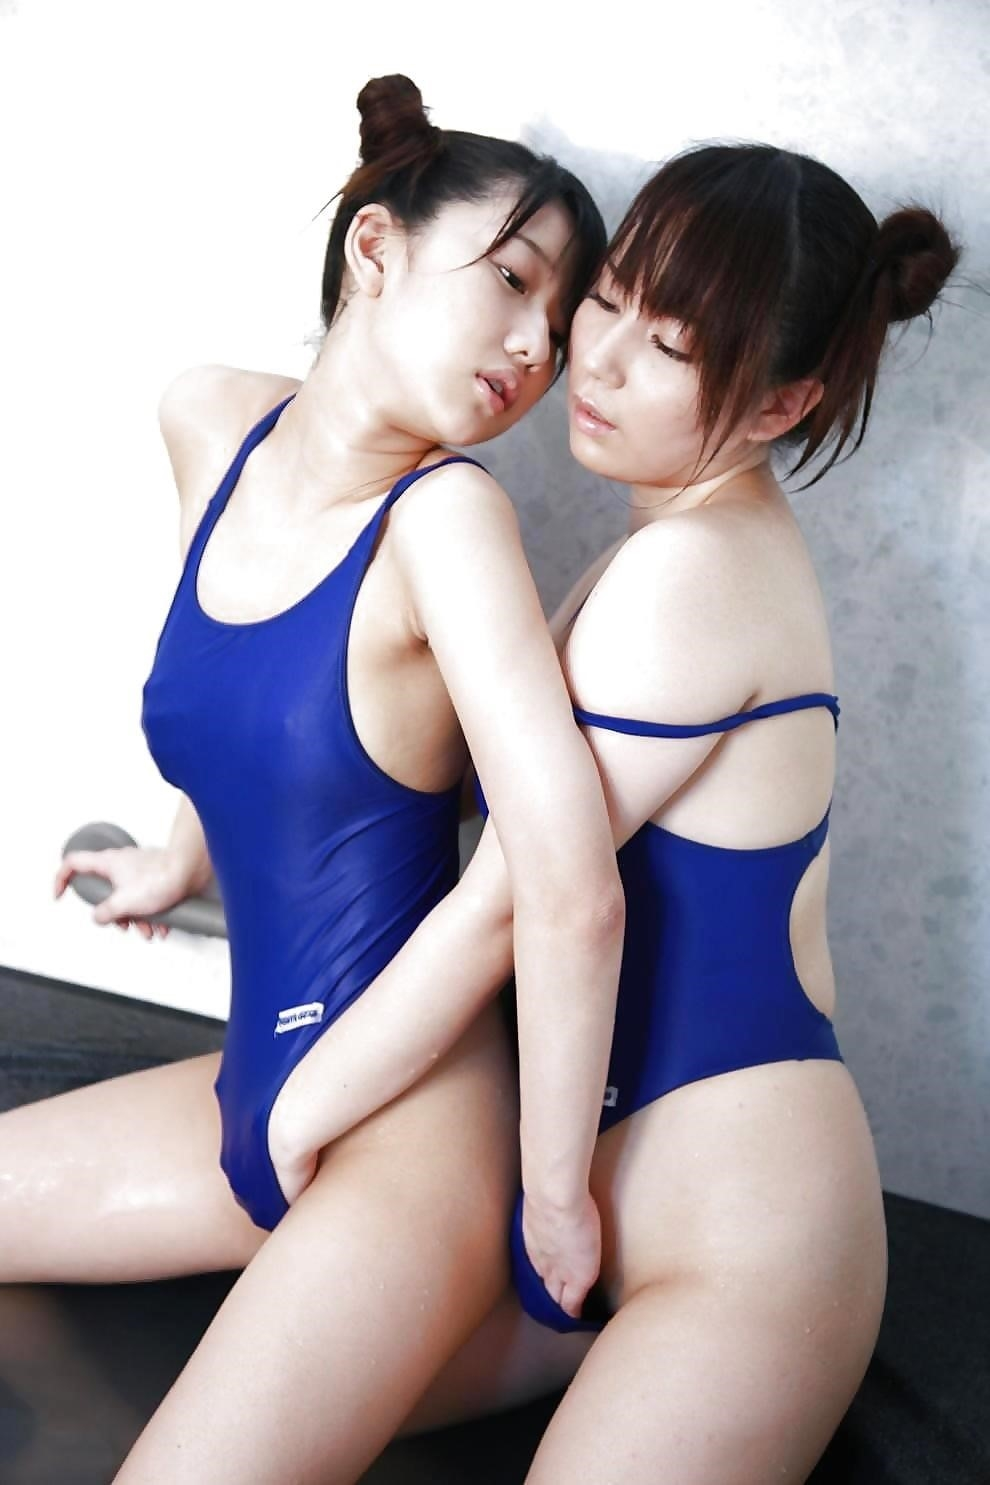 Girl to girl kissing sex-1450